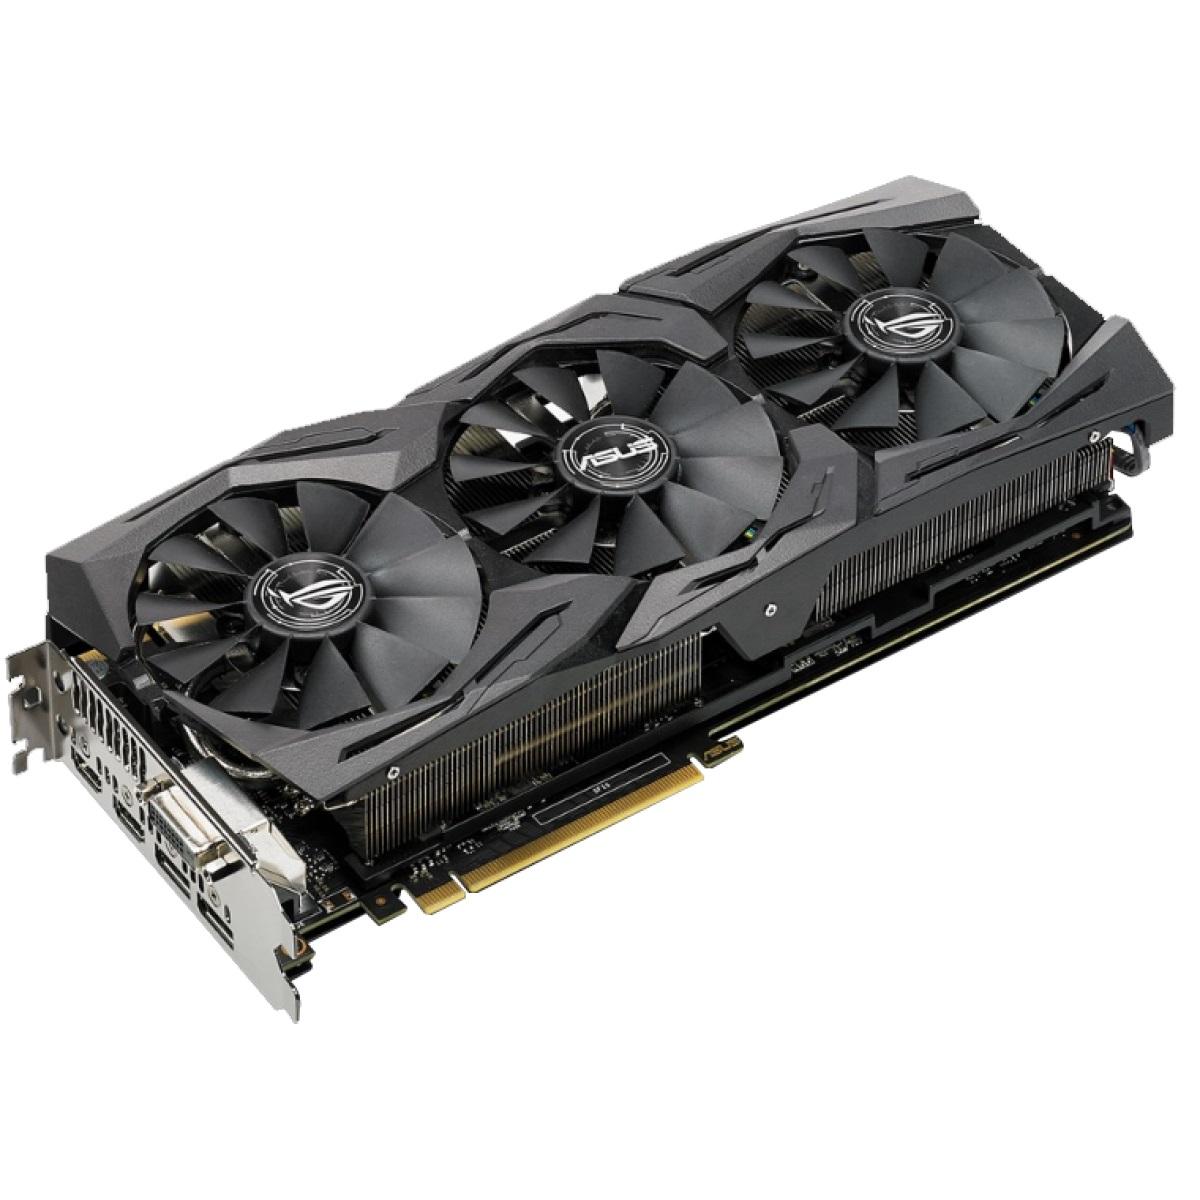 Placa de Vídeo Geforce ROG GTX 1080 Ti Strix 11GB OC ROG-STRIX-GTX1080TI-O11G-GAMING 11GB GDDR5X - Asus